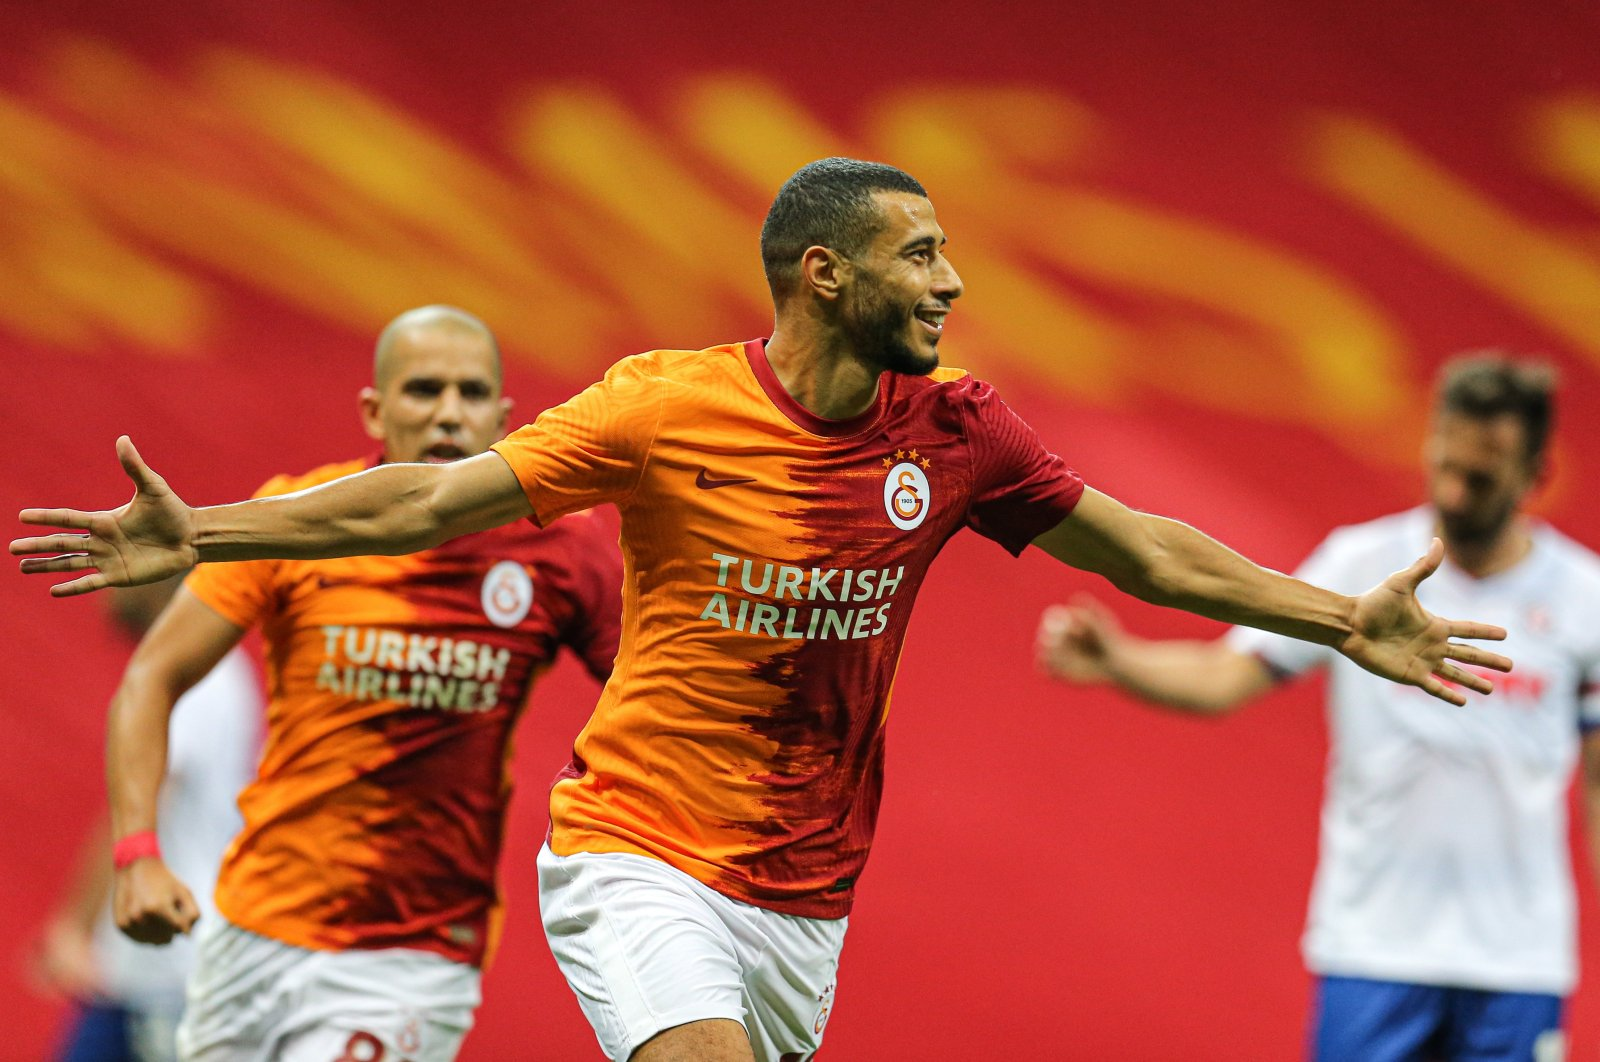 Galatasaray's Younes Belhanda celebrates a goal during a UEFA Europa League qualifying match against Hajduk Split, in Istanbul, Turkey, Sept. 24, 2020. (AA Photo)